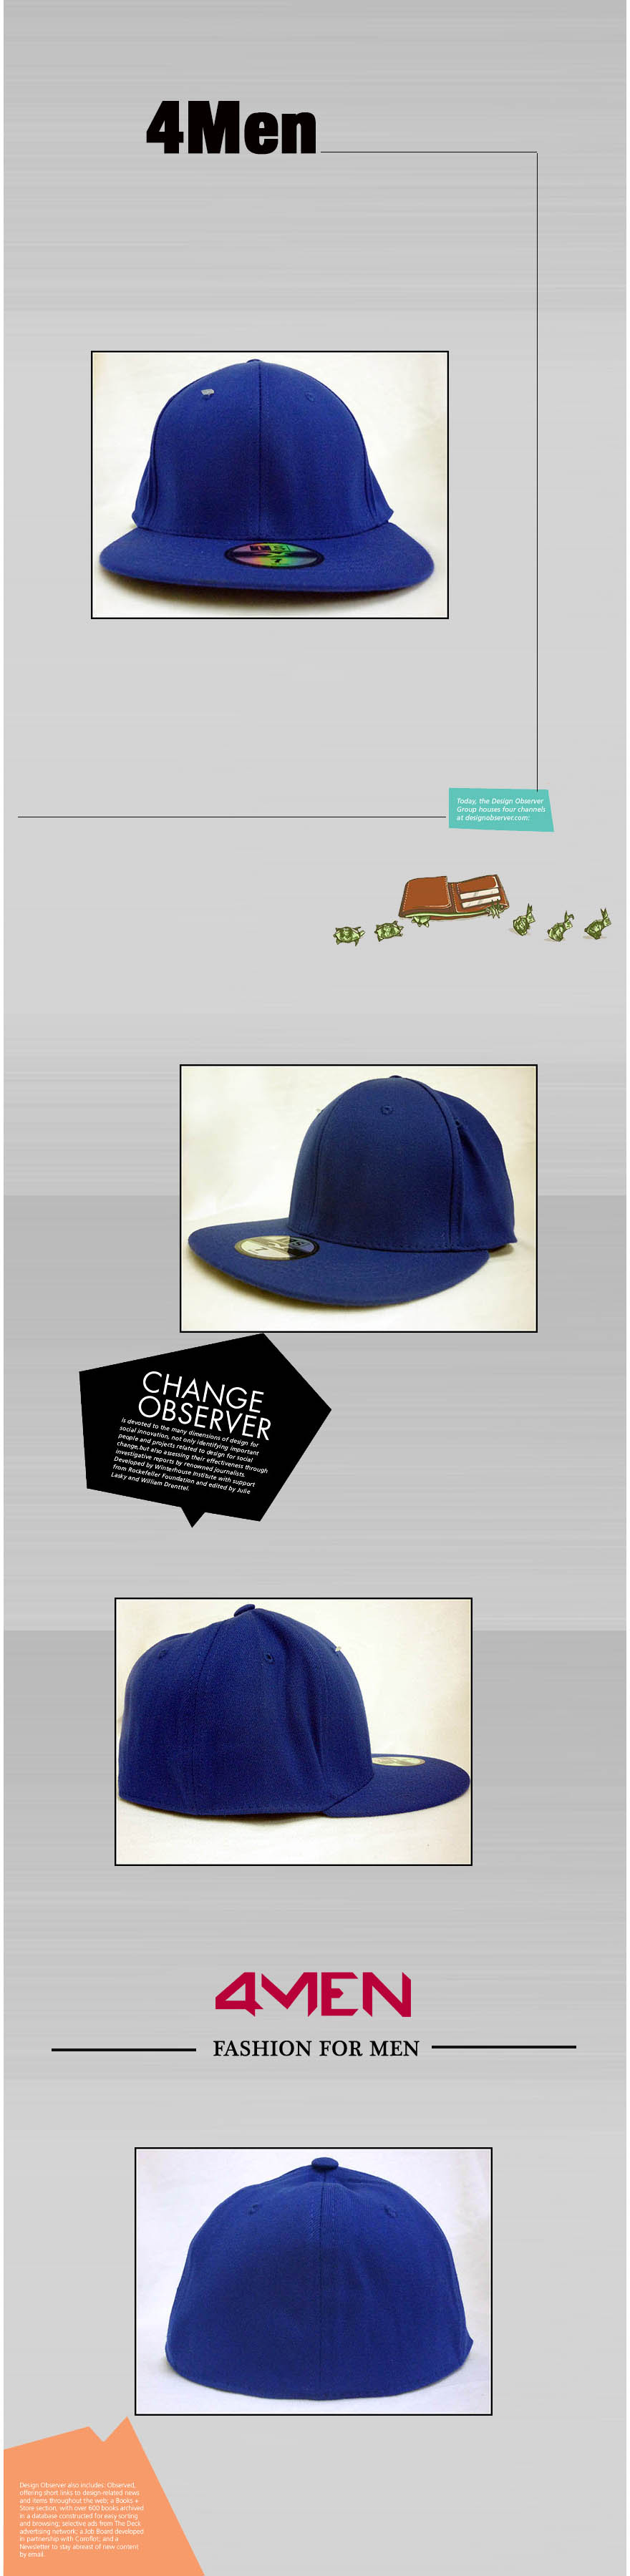 Nón hiphop xanh dương nf020 - 1